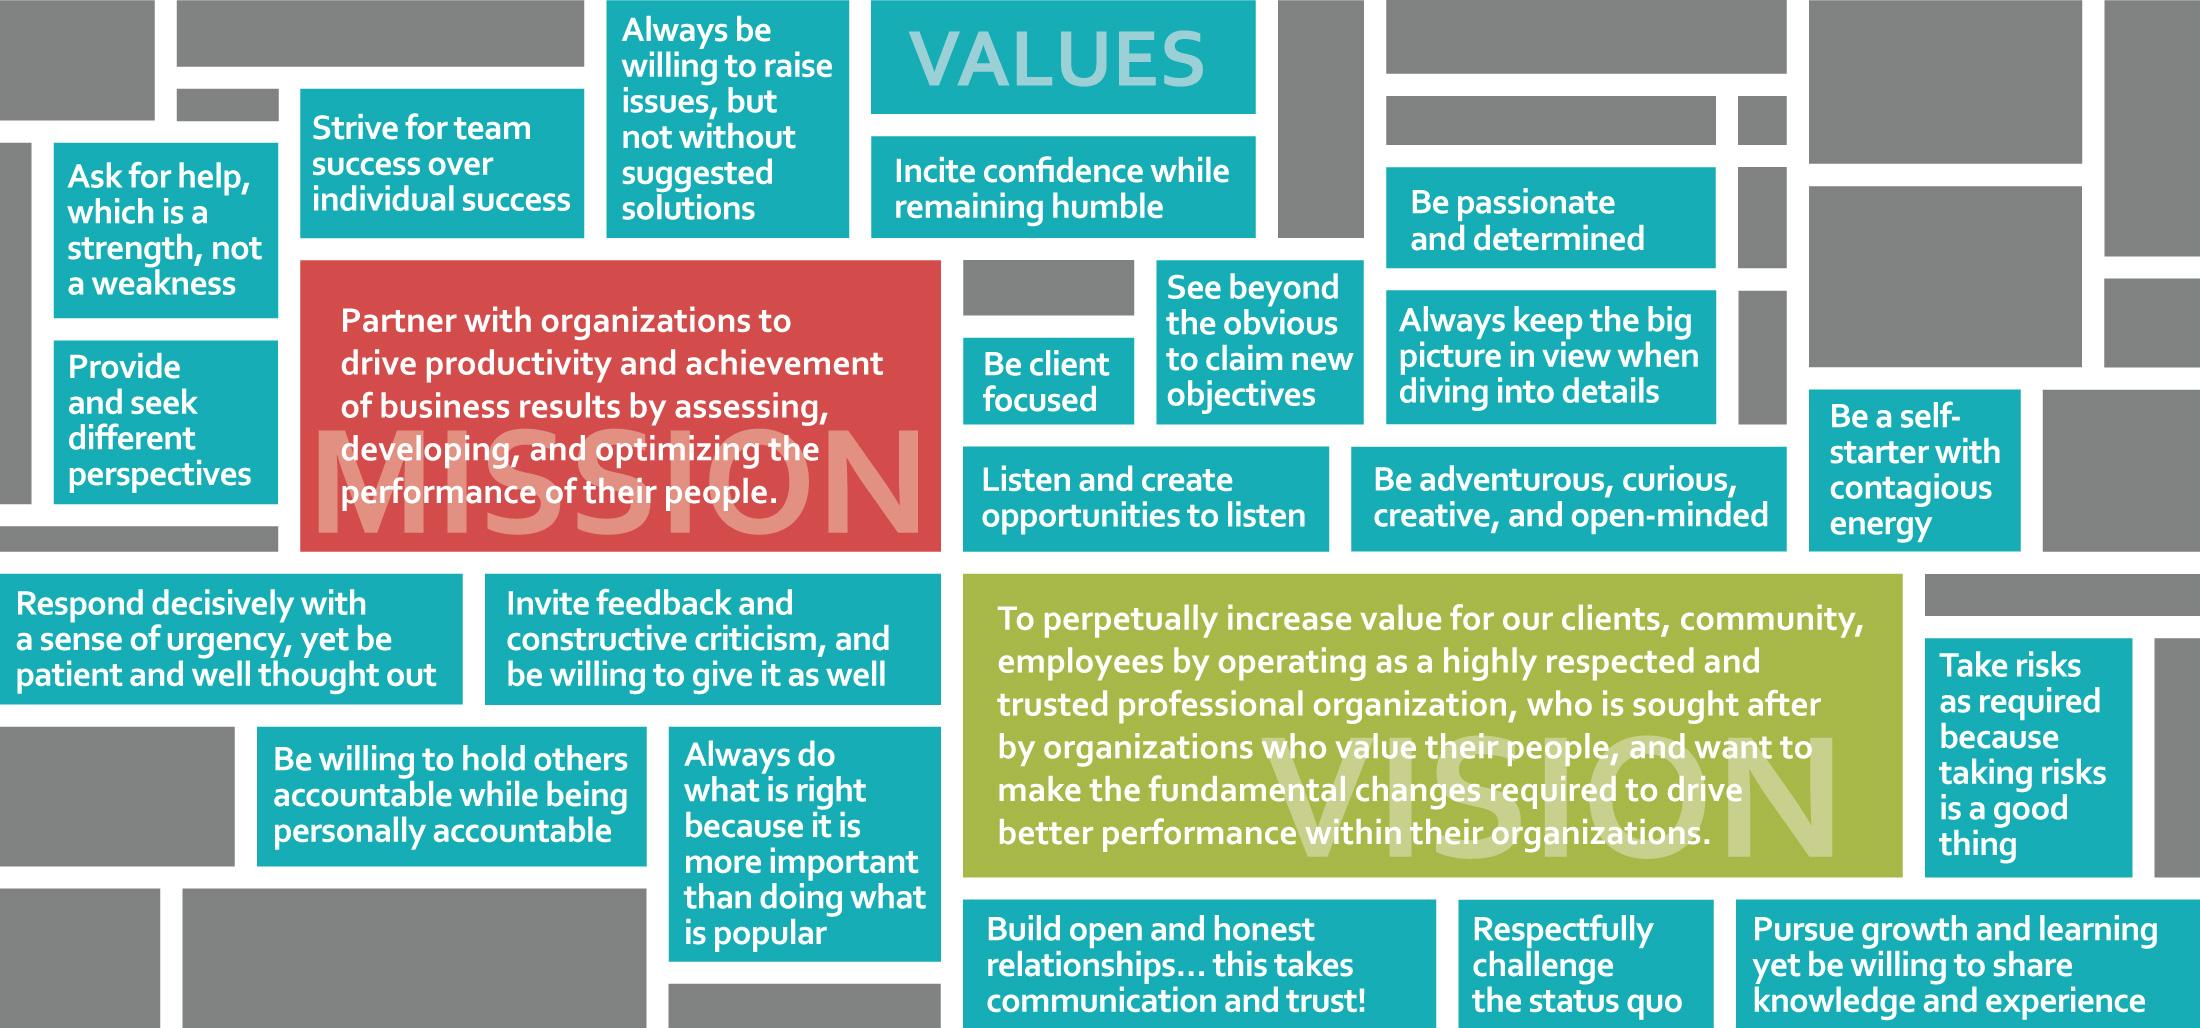 SDI Mission Vision Values